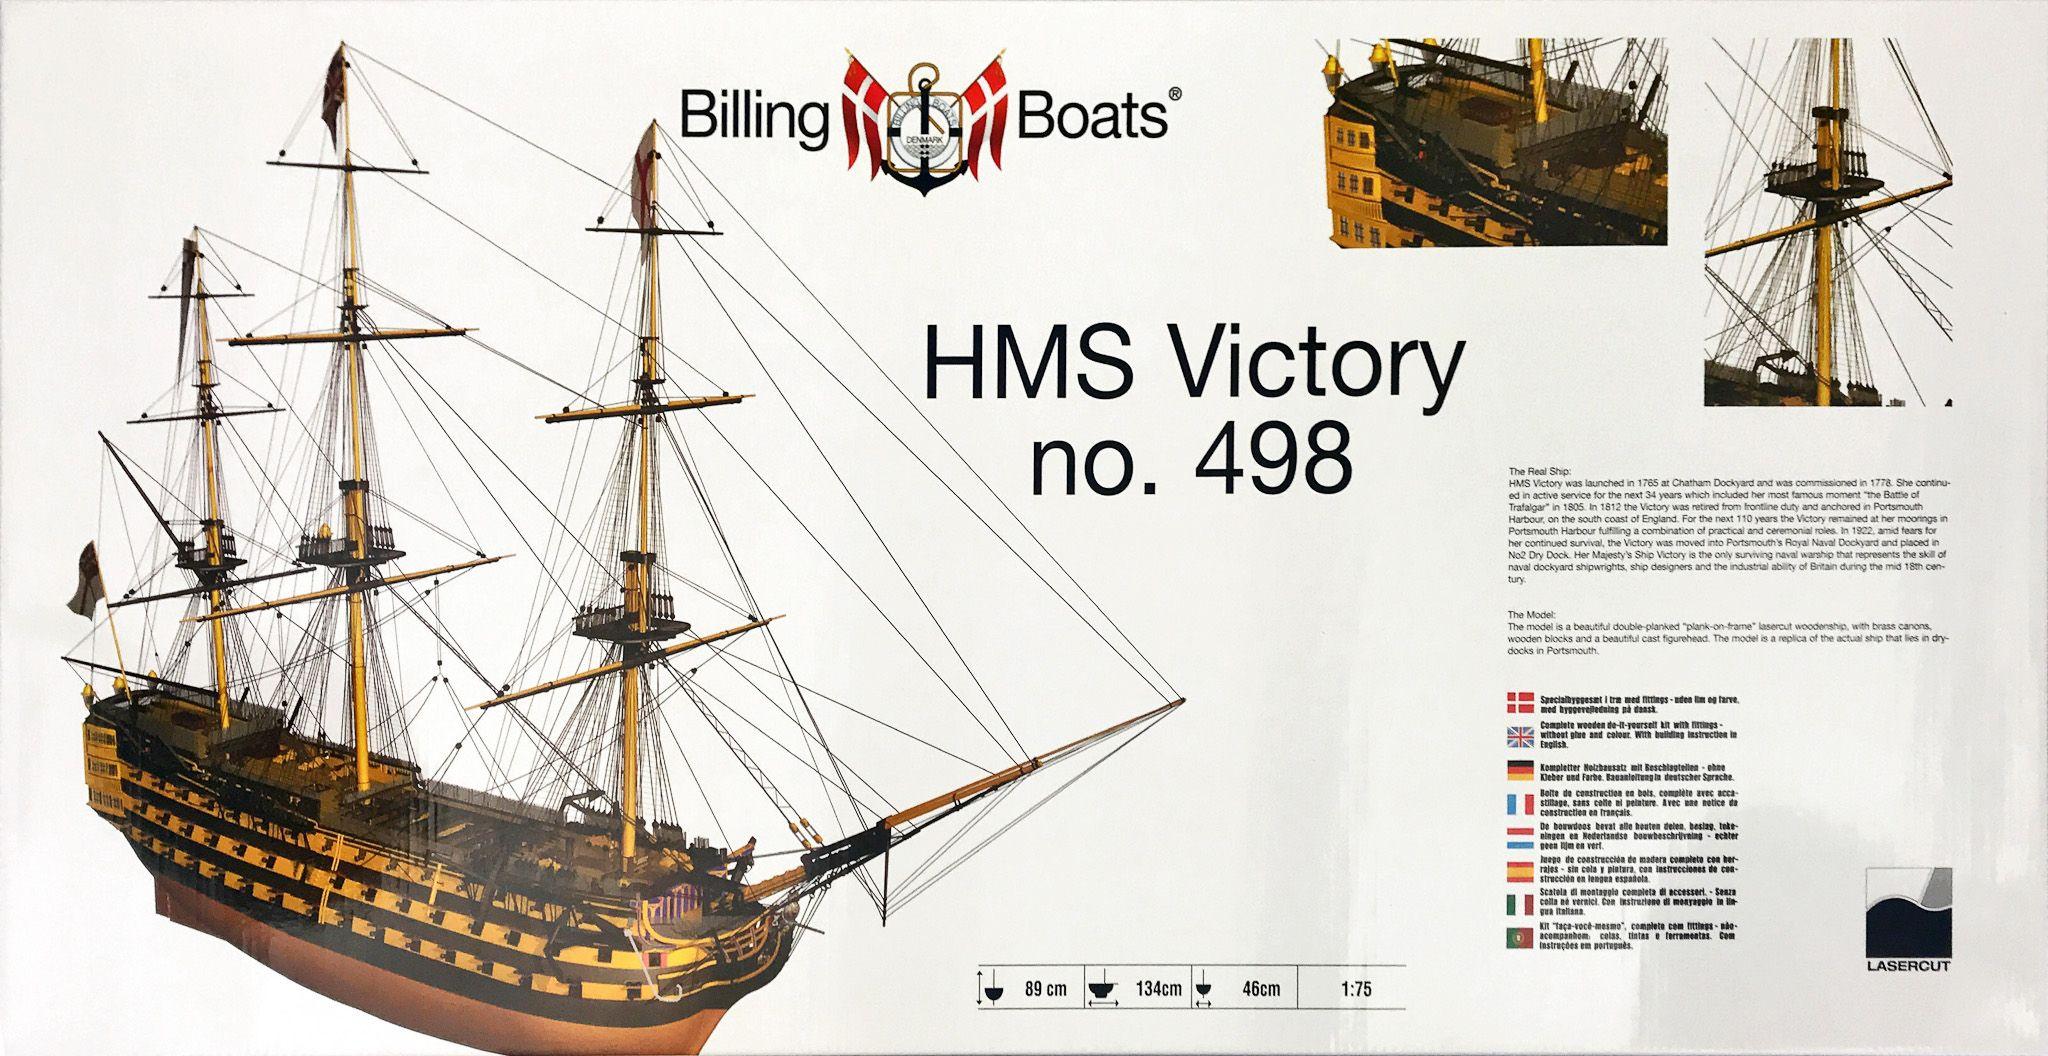 HMS Victory Model Ship Kit - Billing Boats (B498)